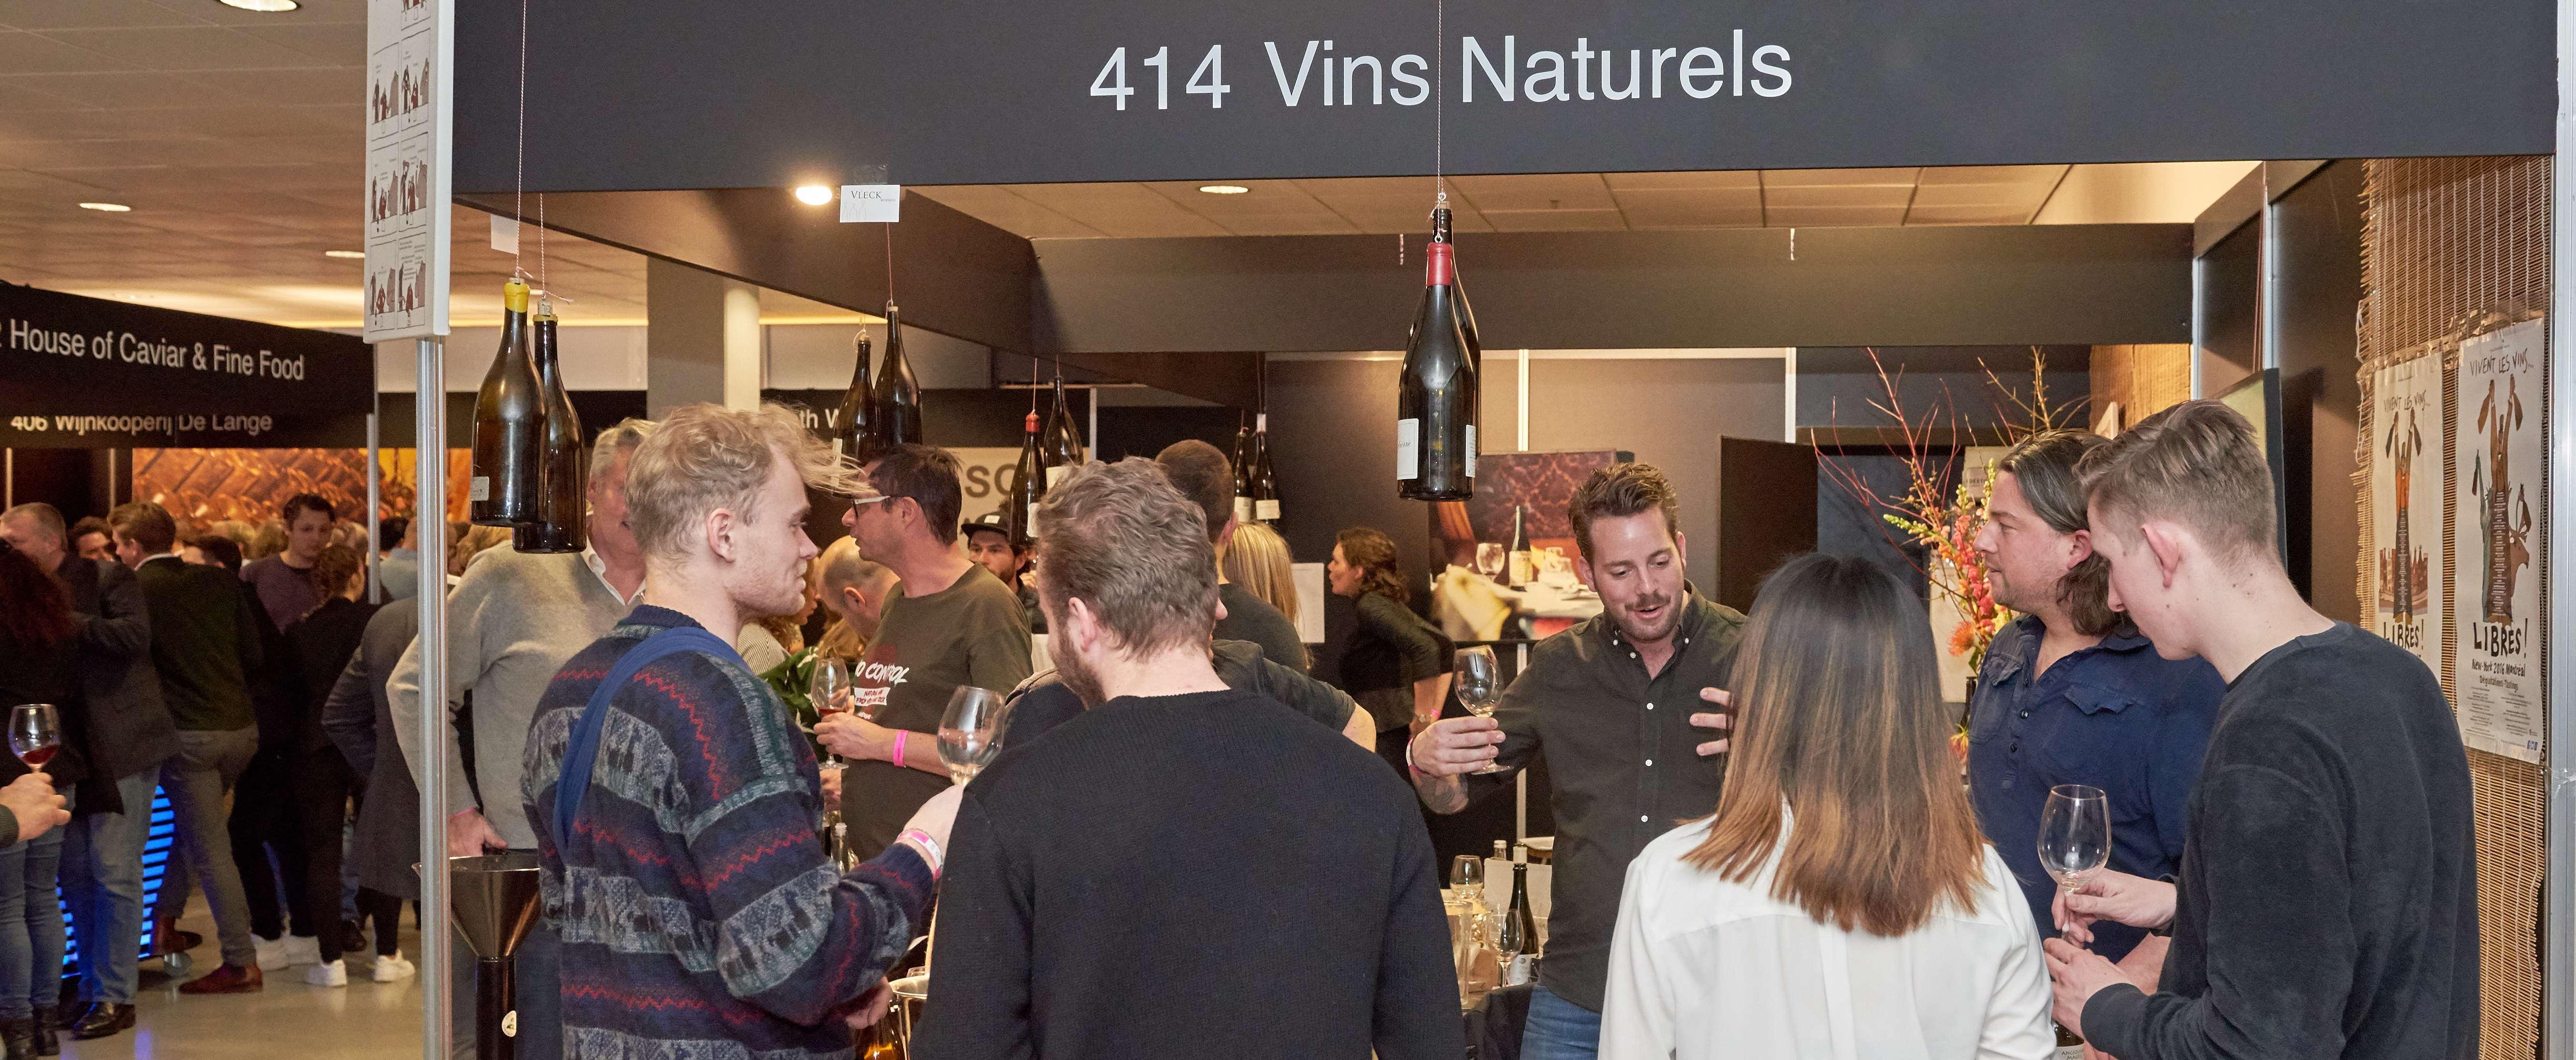 Vins Naturels stand